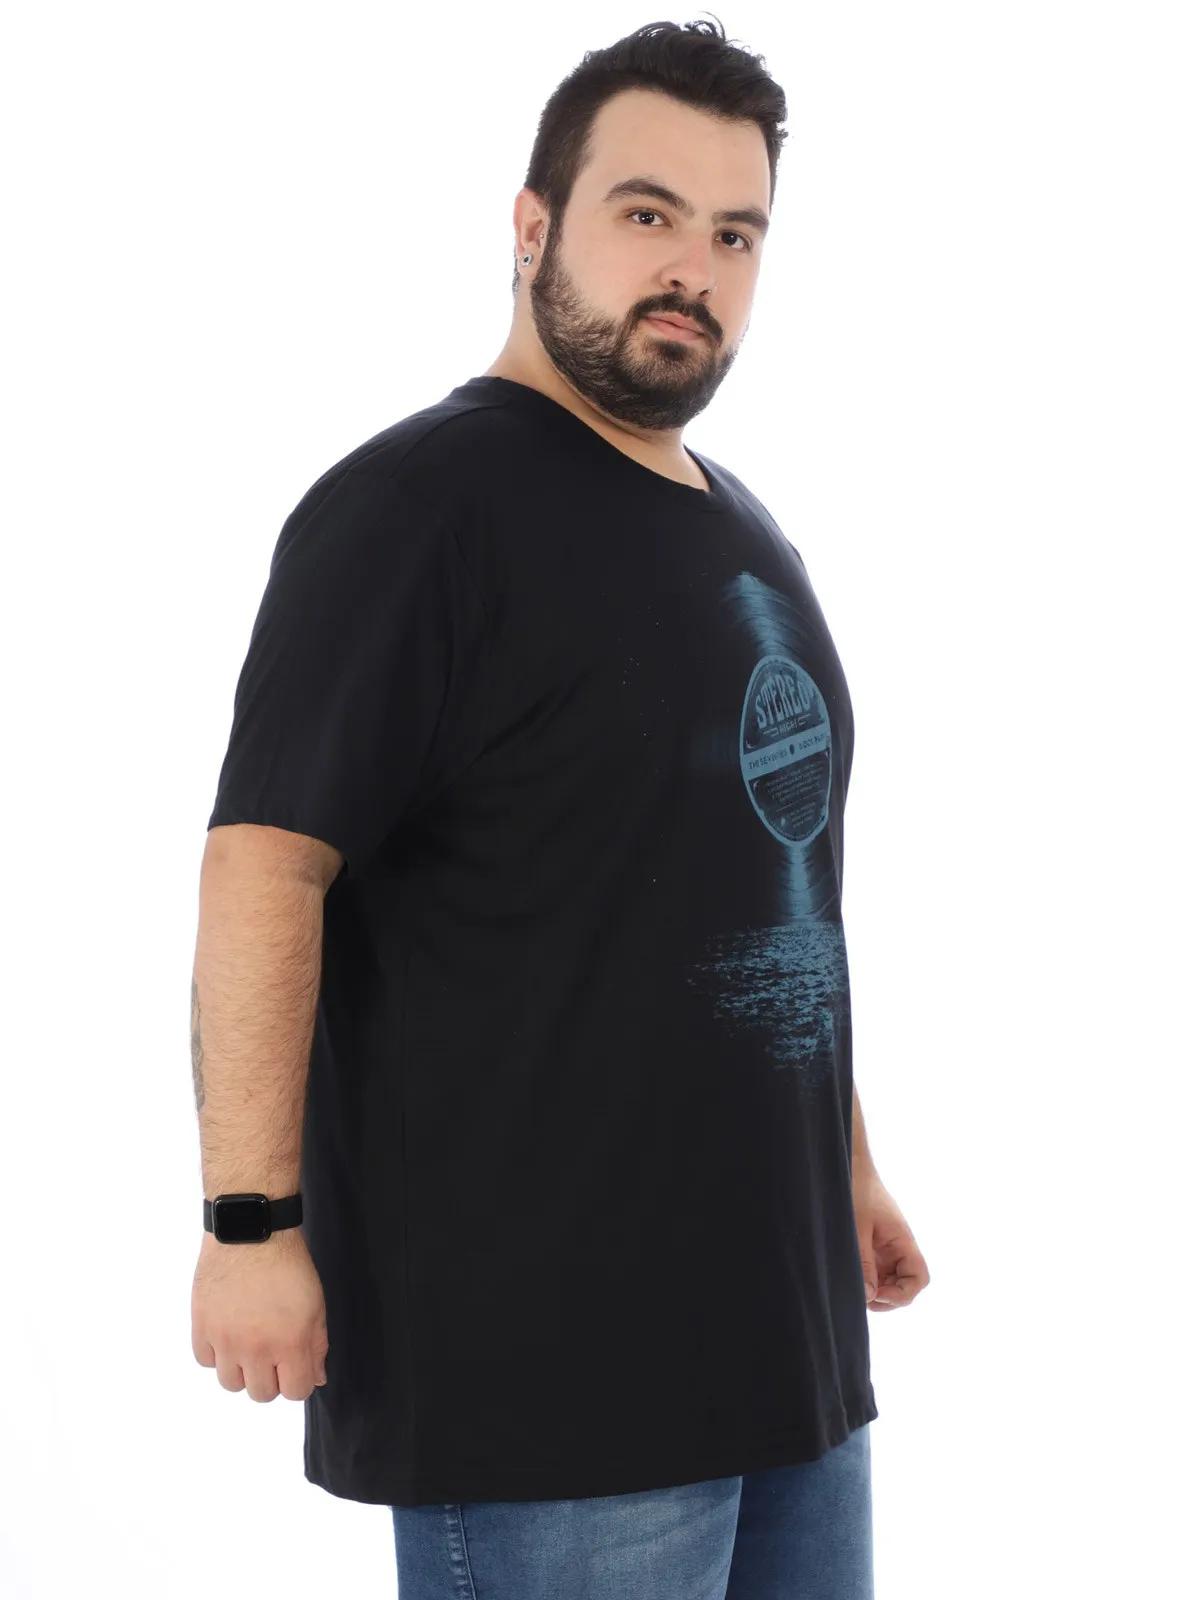 Camiseta Plus Size Masculina Manga Curta Gola Redonda Preta